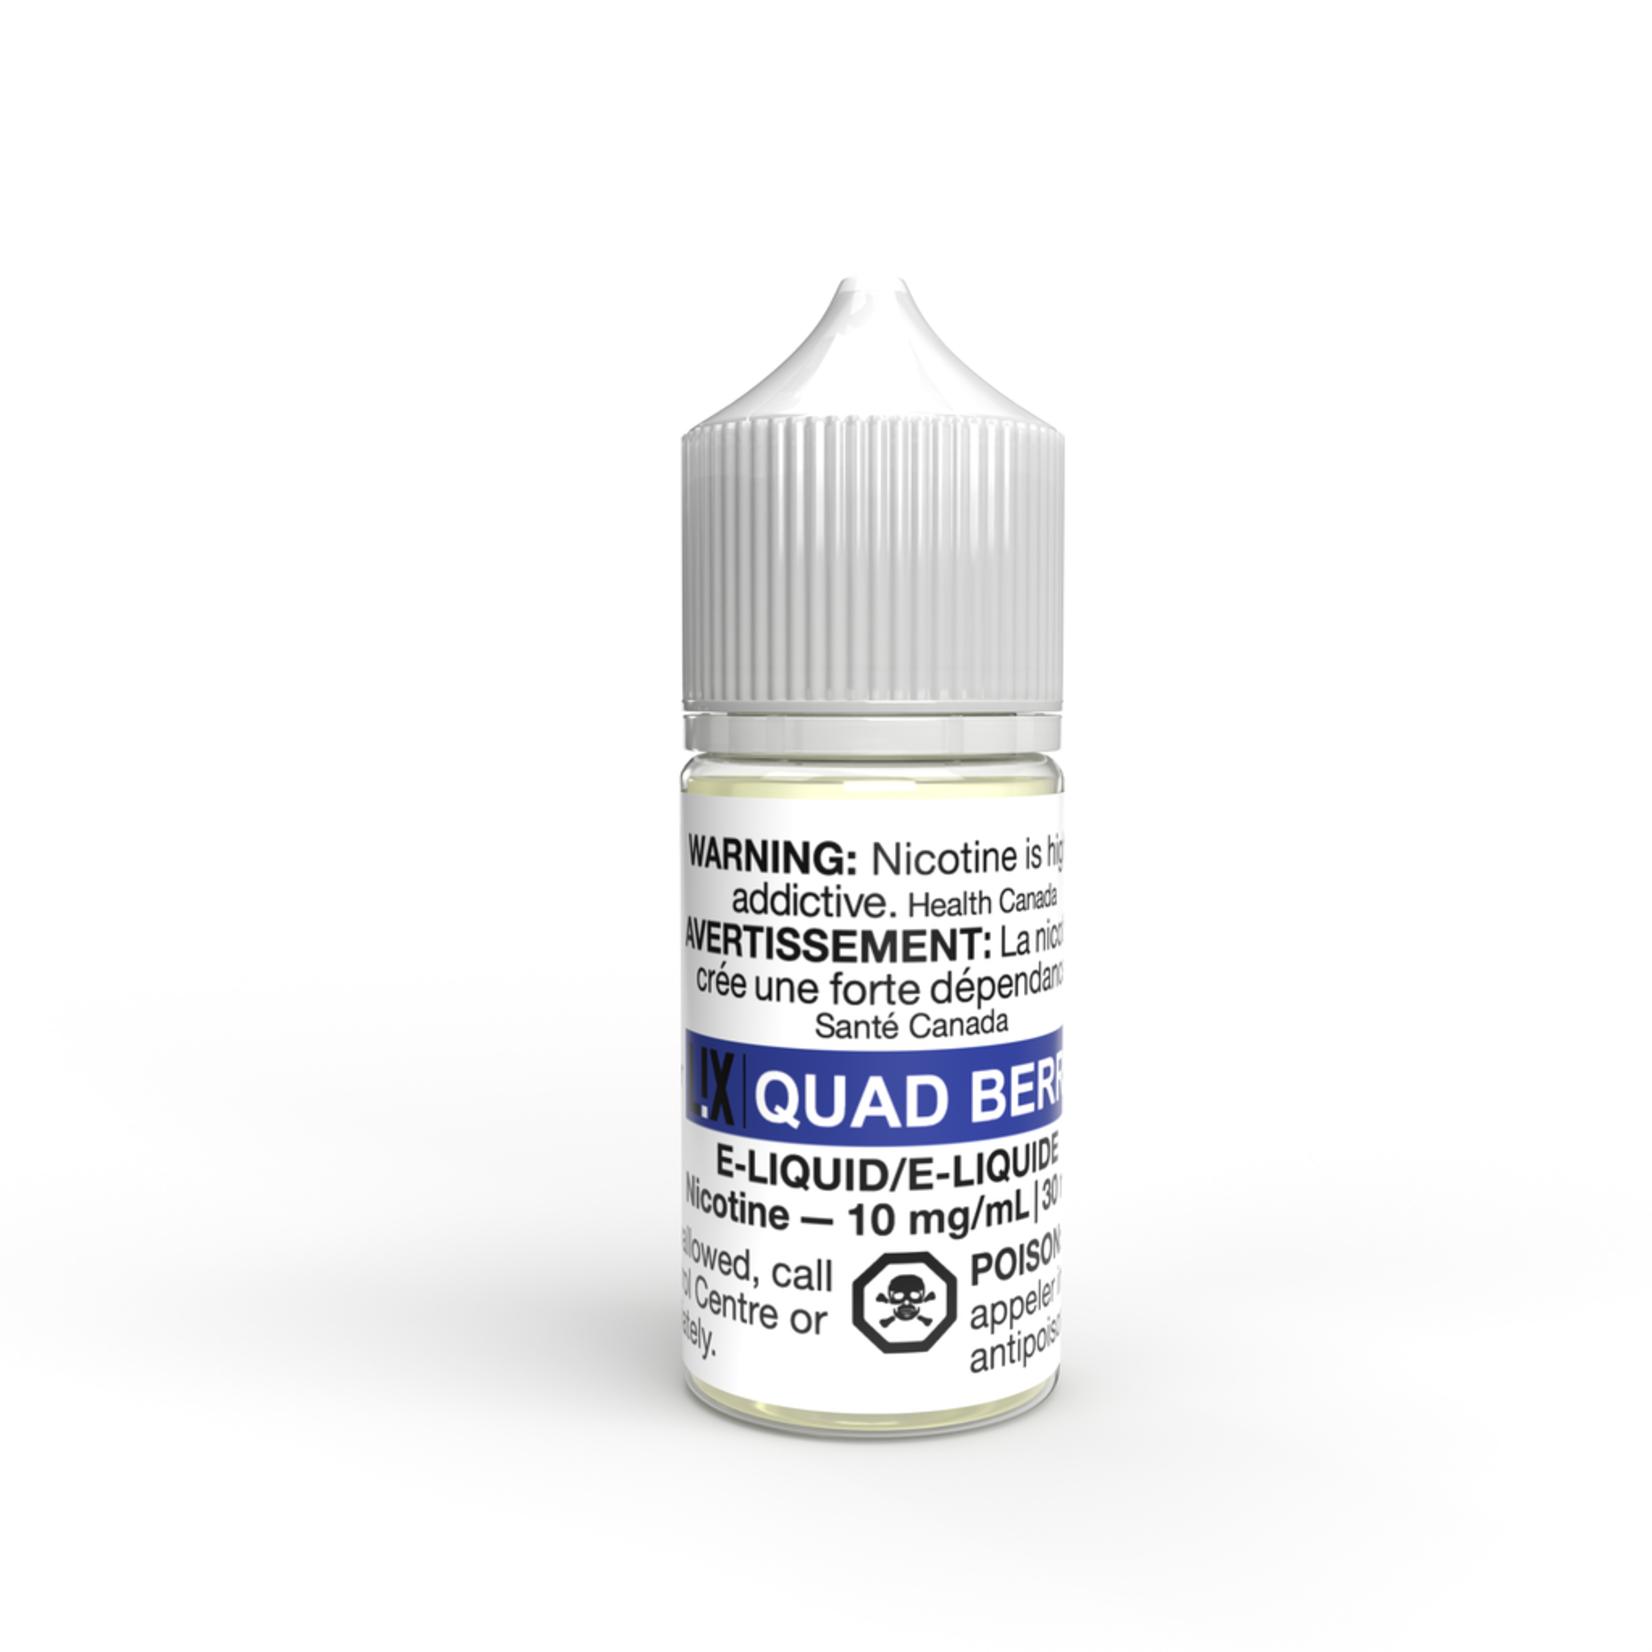 Salt Lix Quad Berry